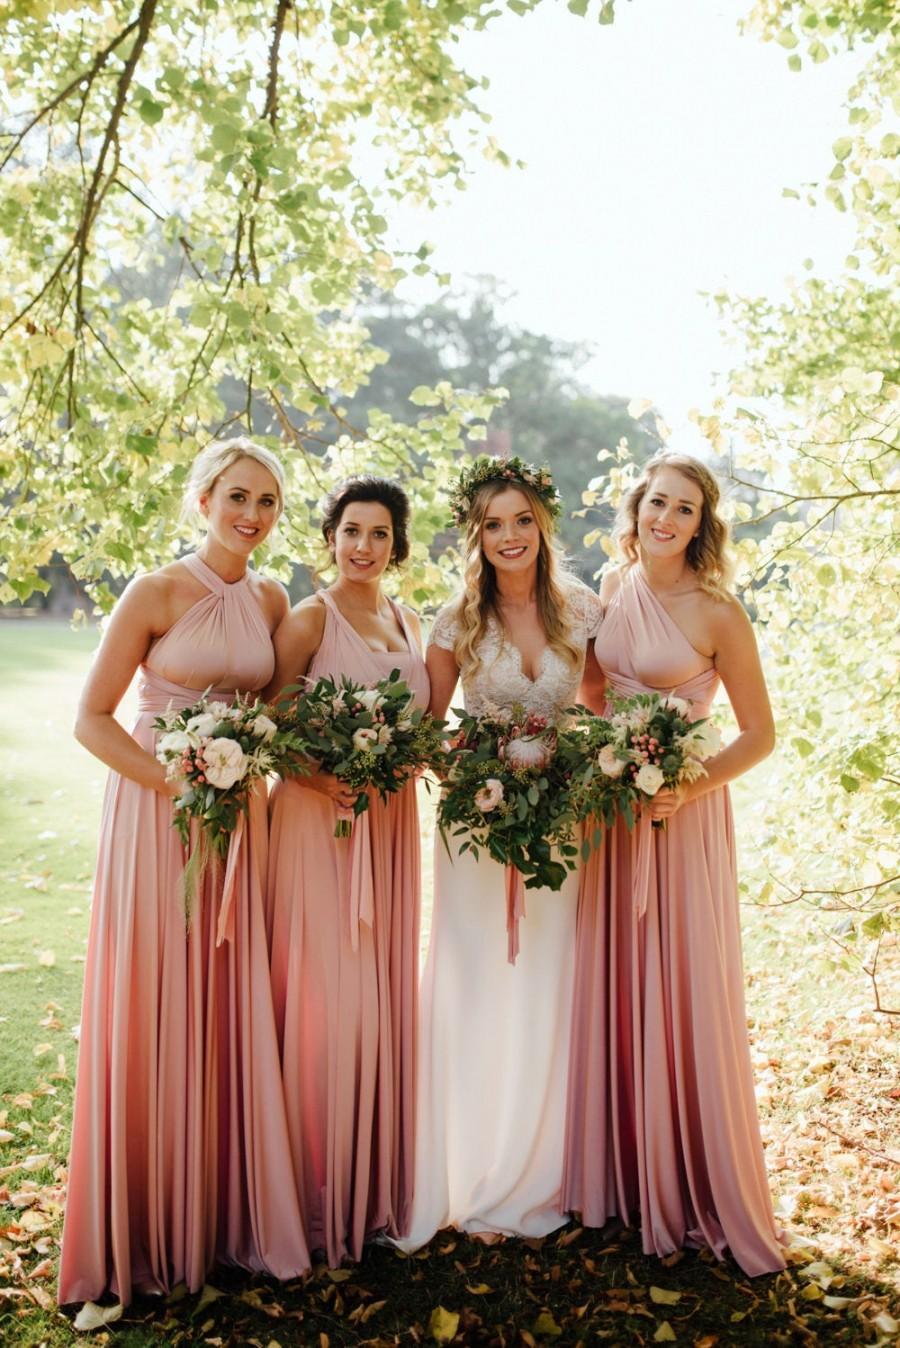 Wedding - Long/Short Blush Bridesmaid Dress Convertible Bridesmaid Dress Multi-way Wrap Dress Maternity Dress Infinity Bridesmaid Dress Evening Gown